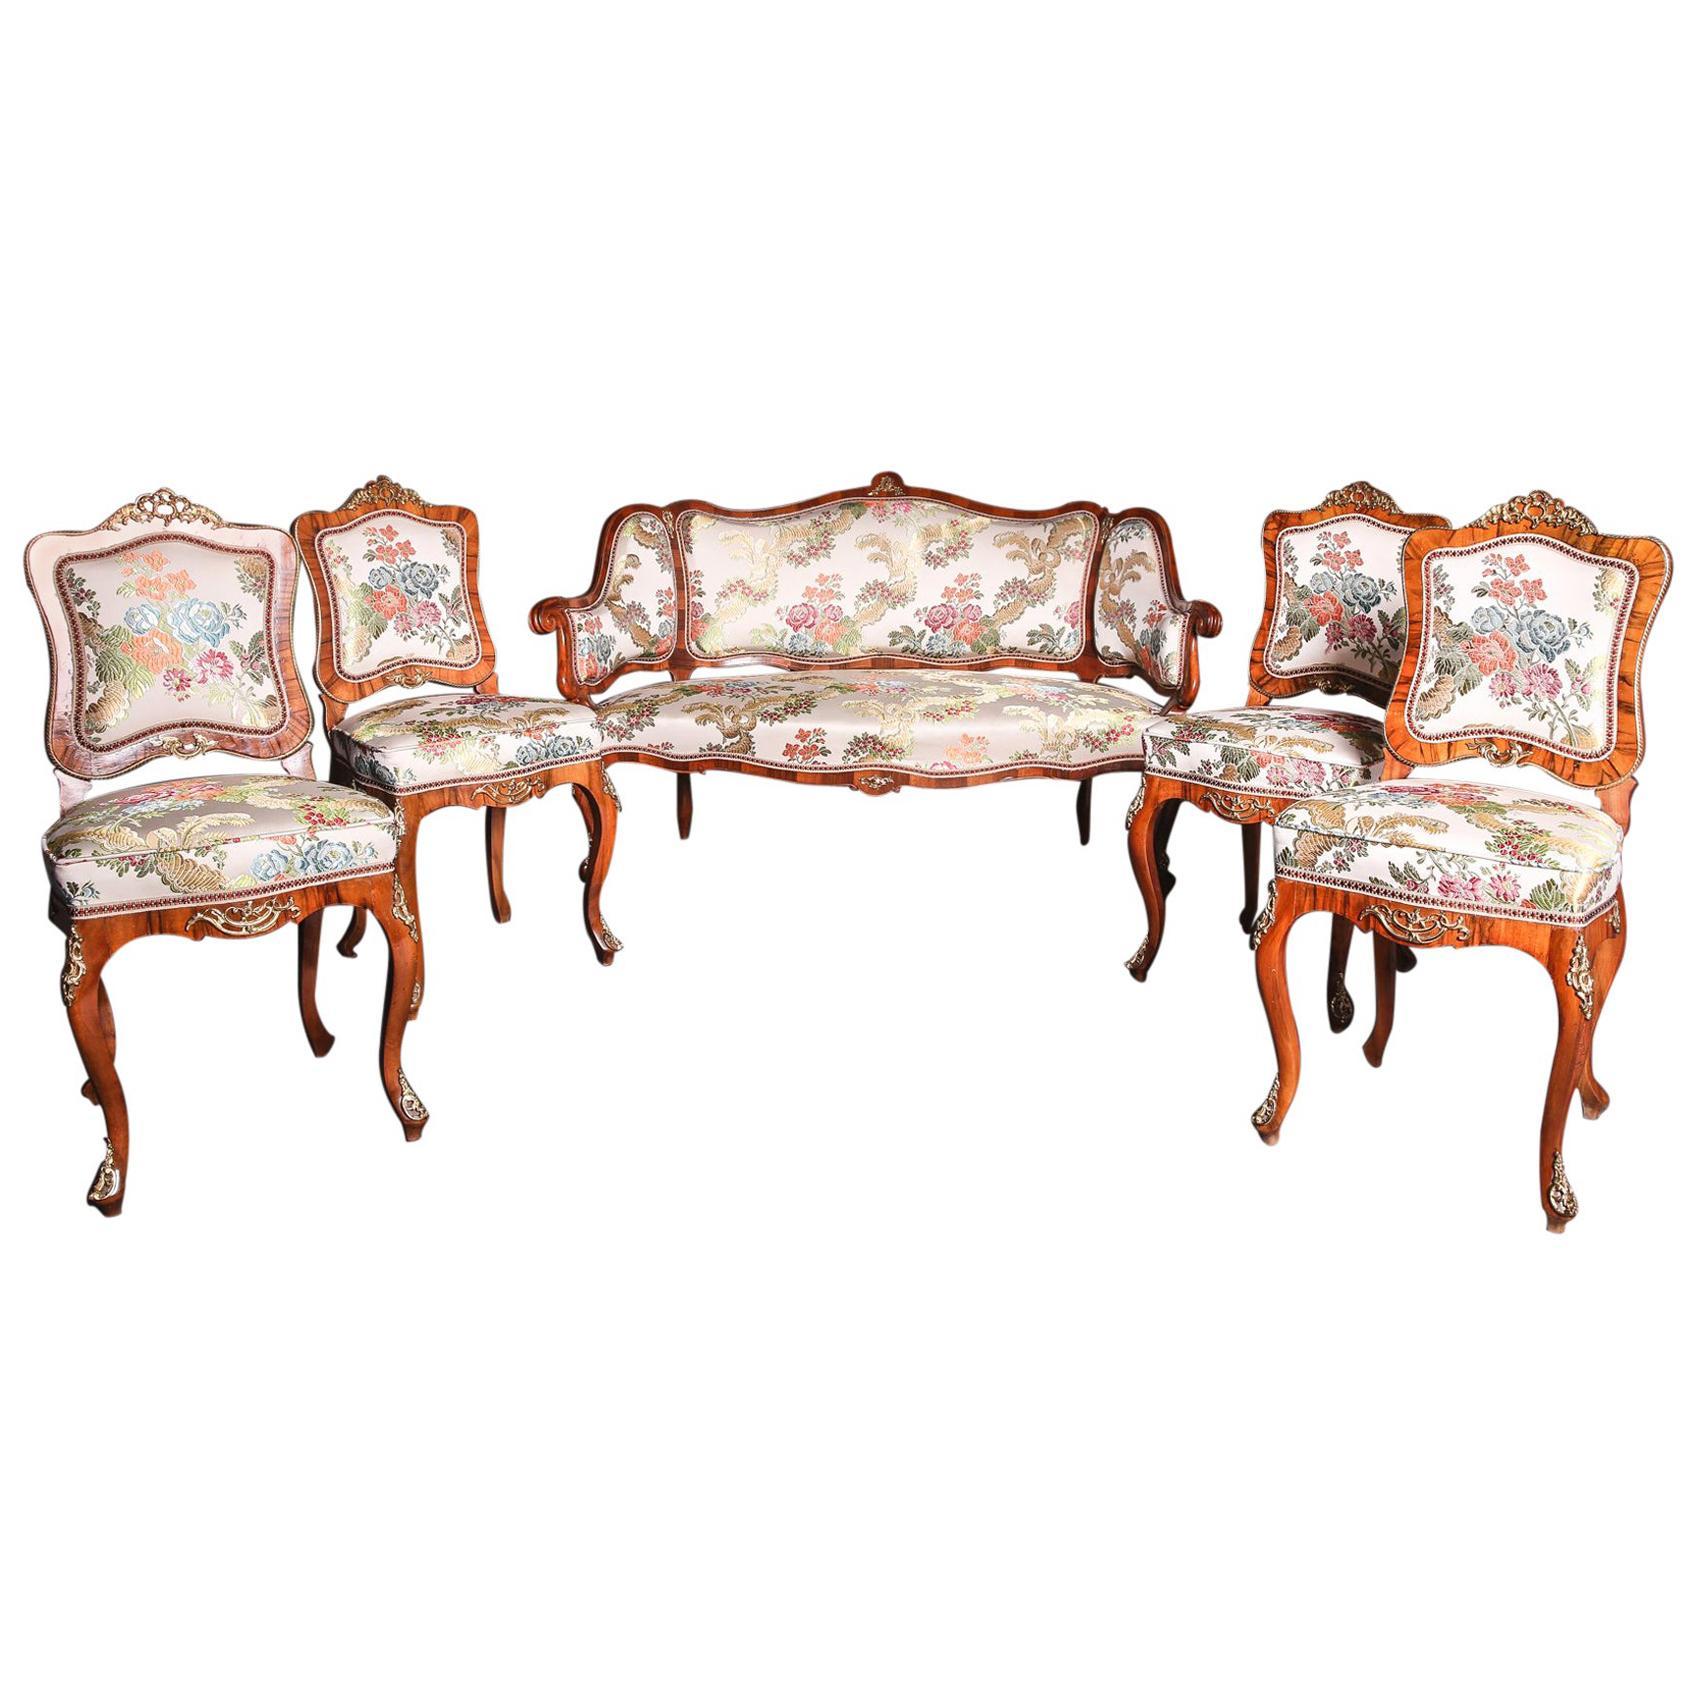 19th Century Baroque Saxony Seat Group, 1880